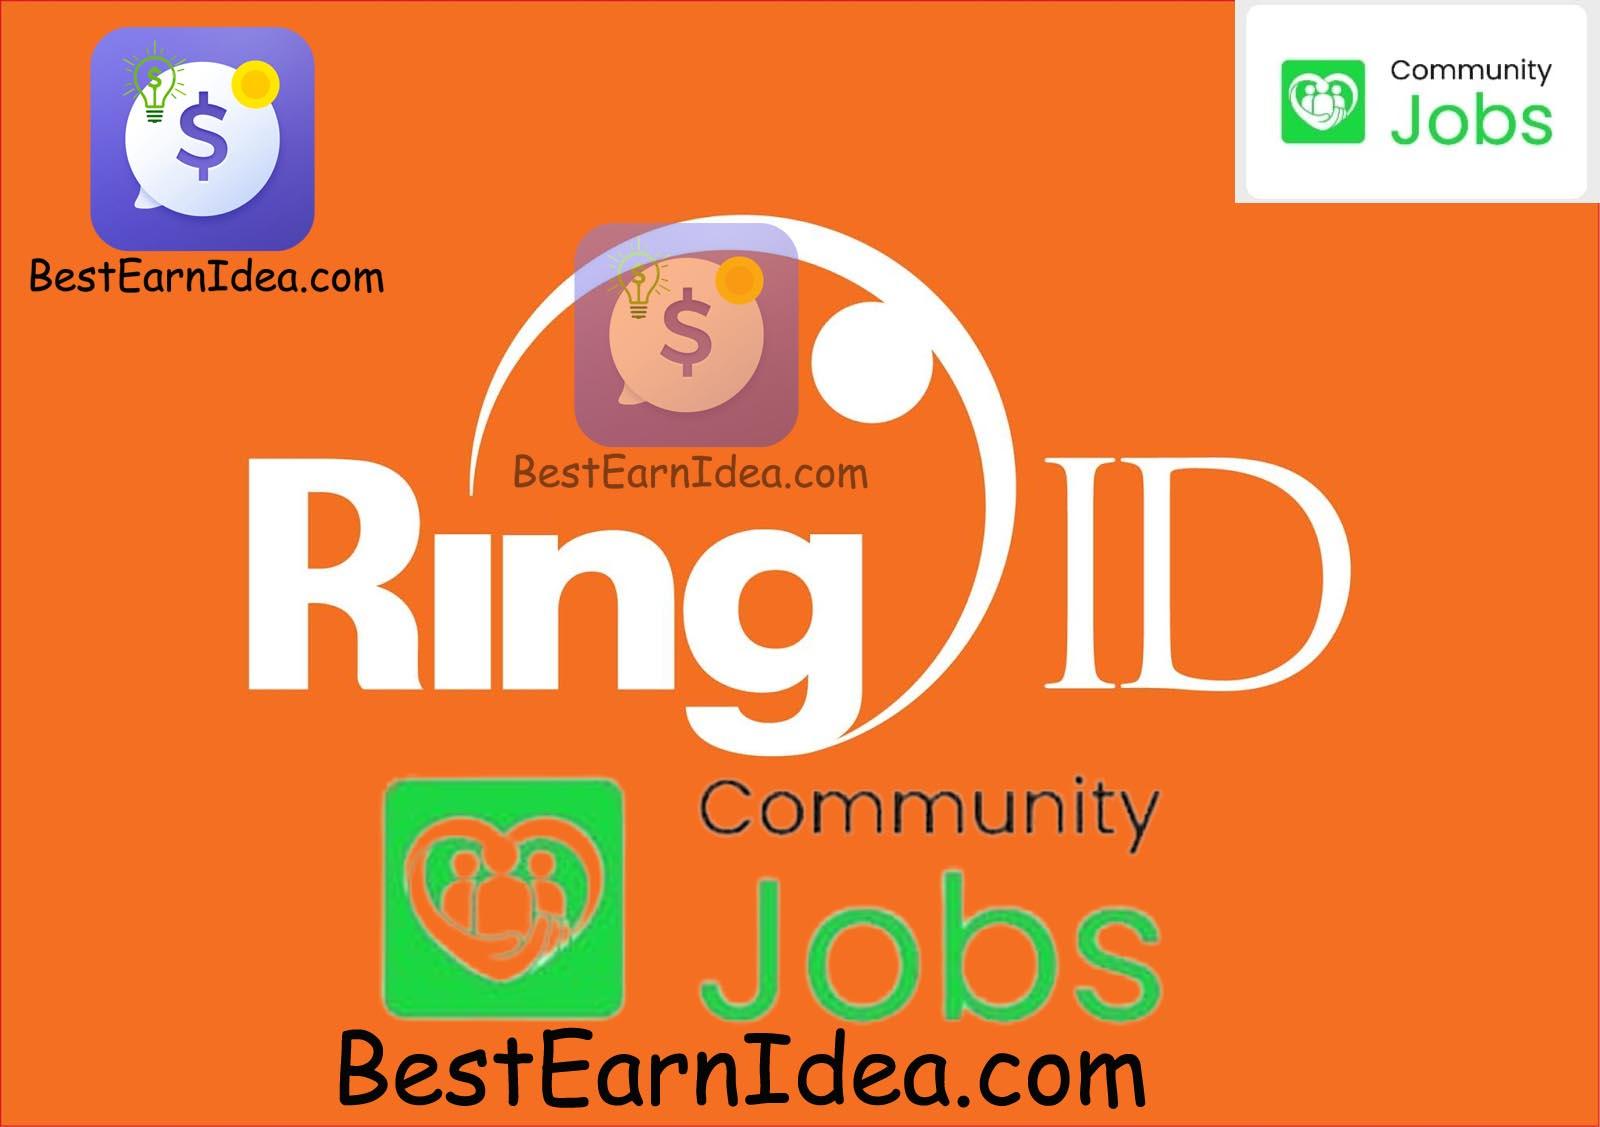 Ring id community jobs রিং আইডি প্রতি মাসে ১৫ হাজার টাকা ইনকাম